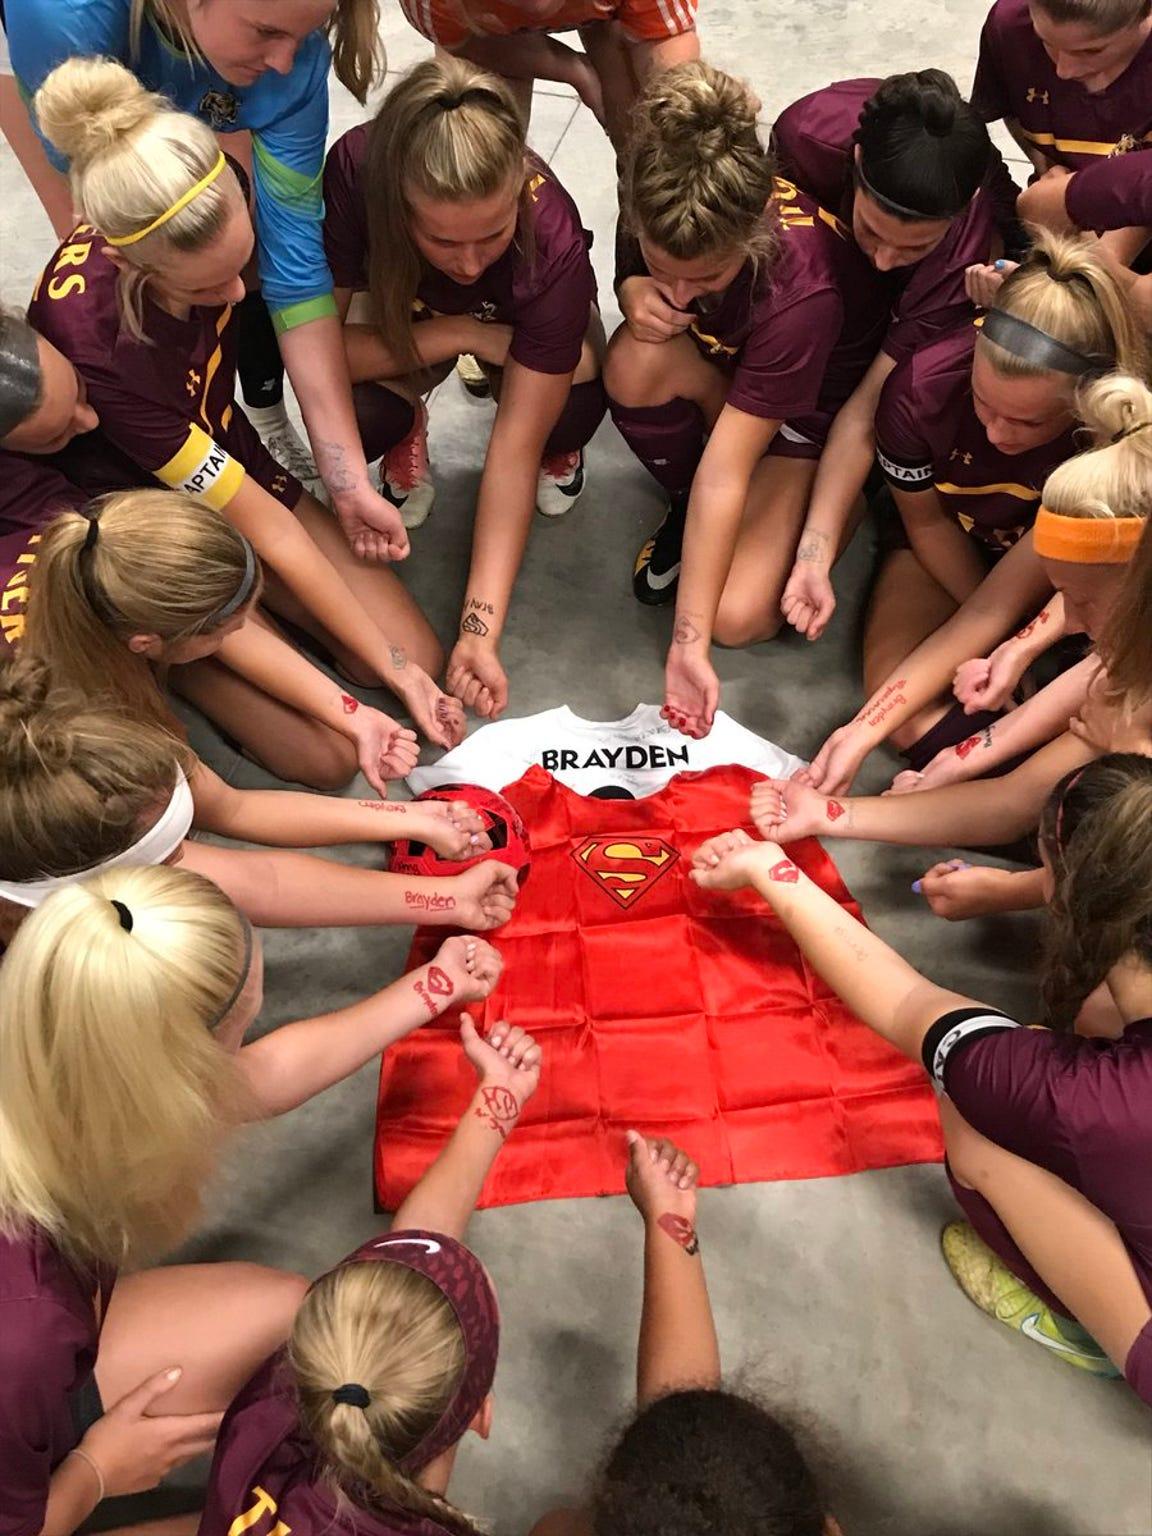 Members of the Harrisburg girls soccer team honor Brayden before their game against O'Gorman.